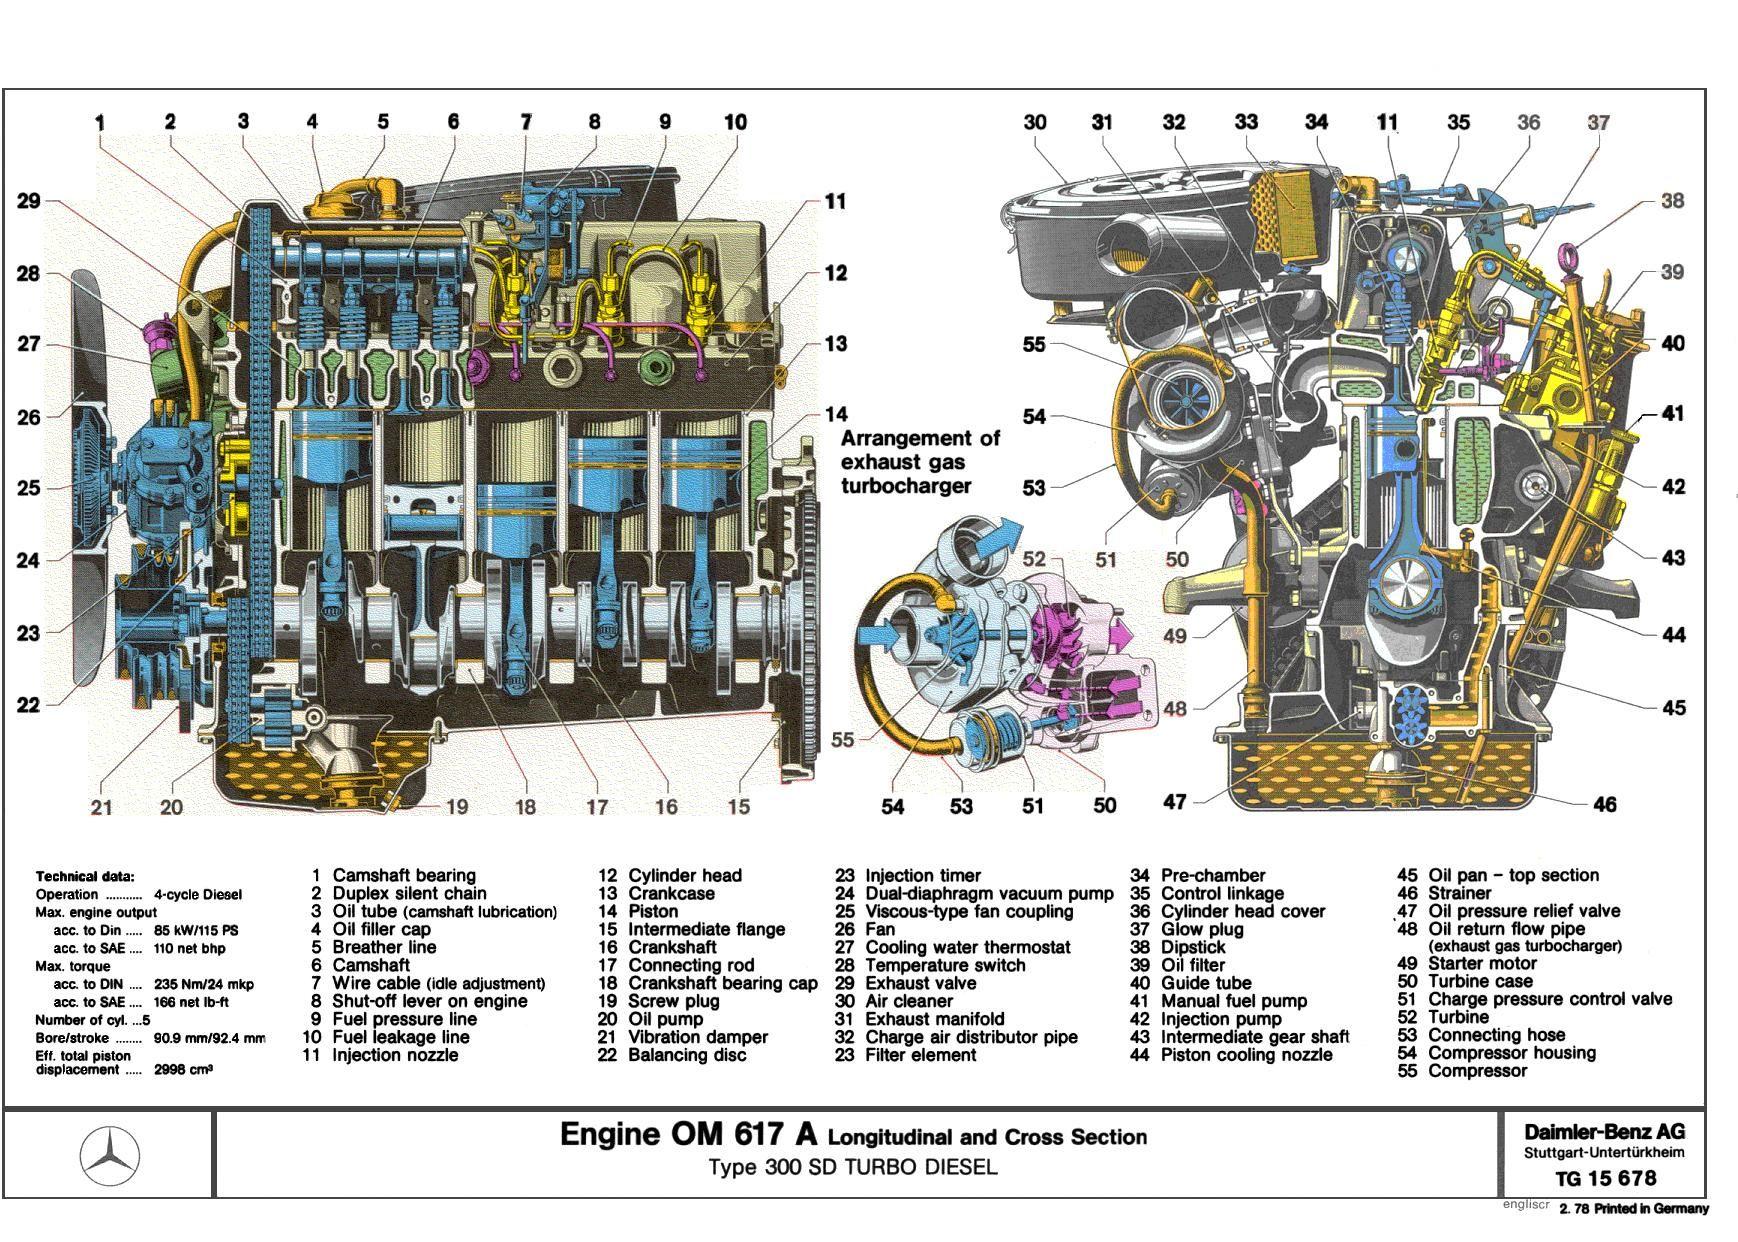 b6c2e5bcf16cf625de72c8bb98487968 mercedes benz om617 5 cylinder turbodiesel engine small diesel om617 wiring diagram at reclaimingppi.co